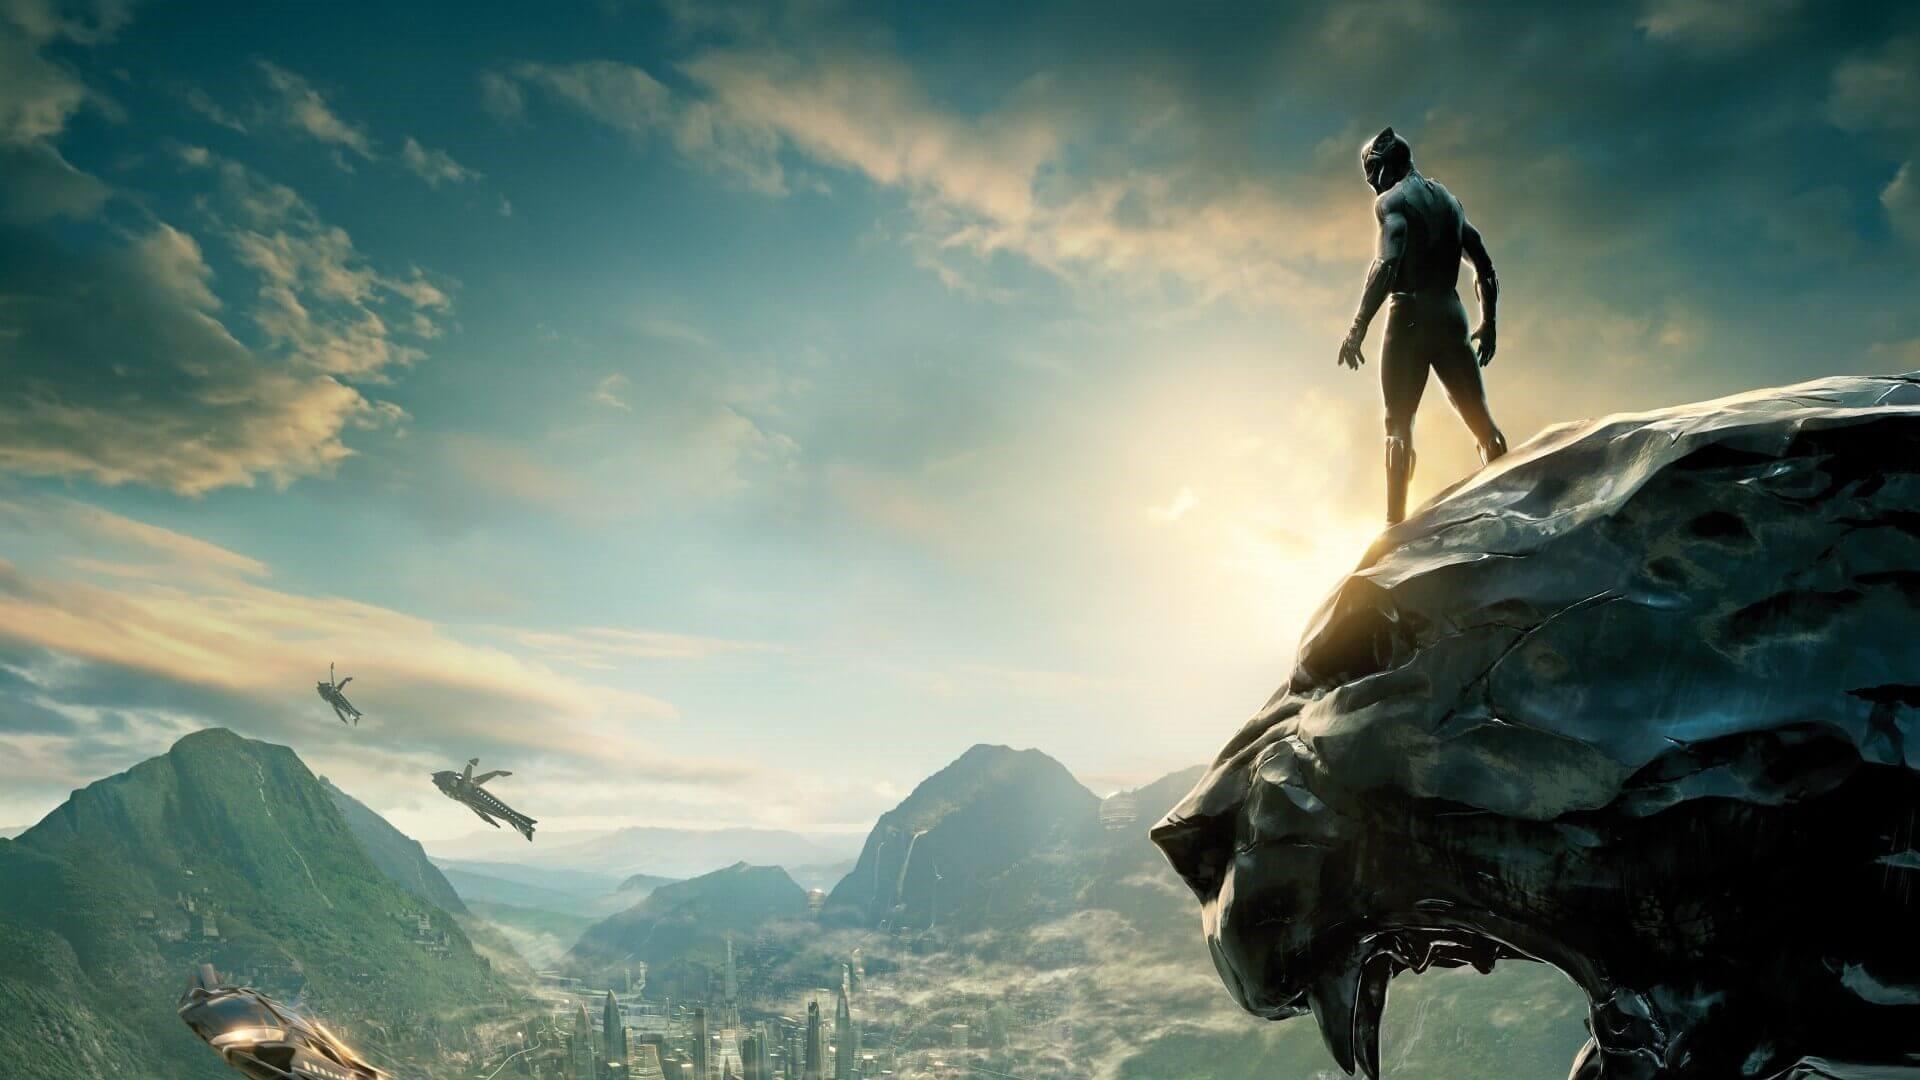 Black Panther Background Wallpaper